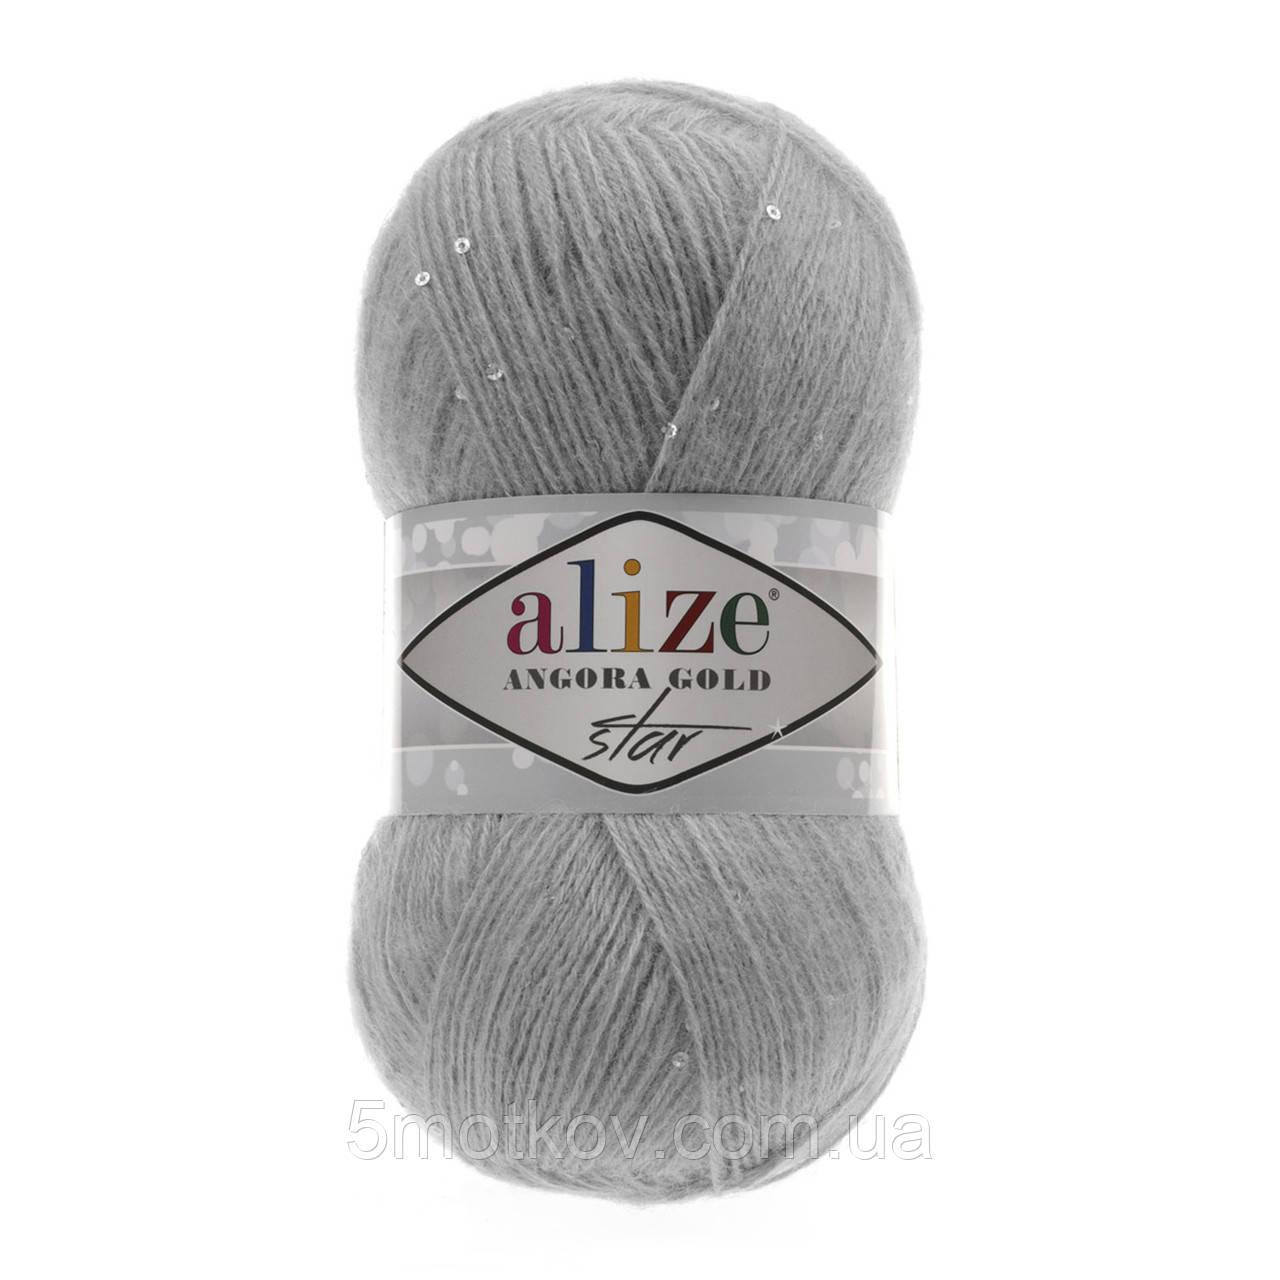 пряжа для вязания с пайетками Alize Angora Gold Star 100гр410м